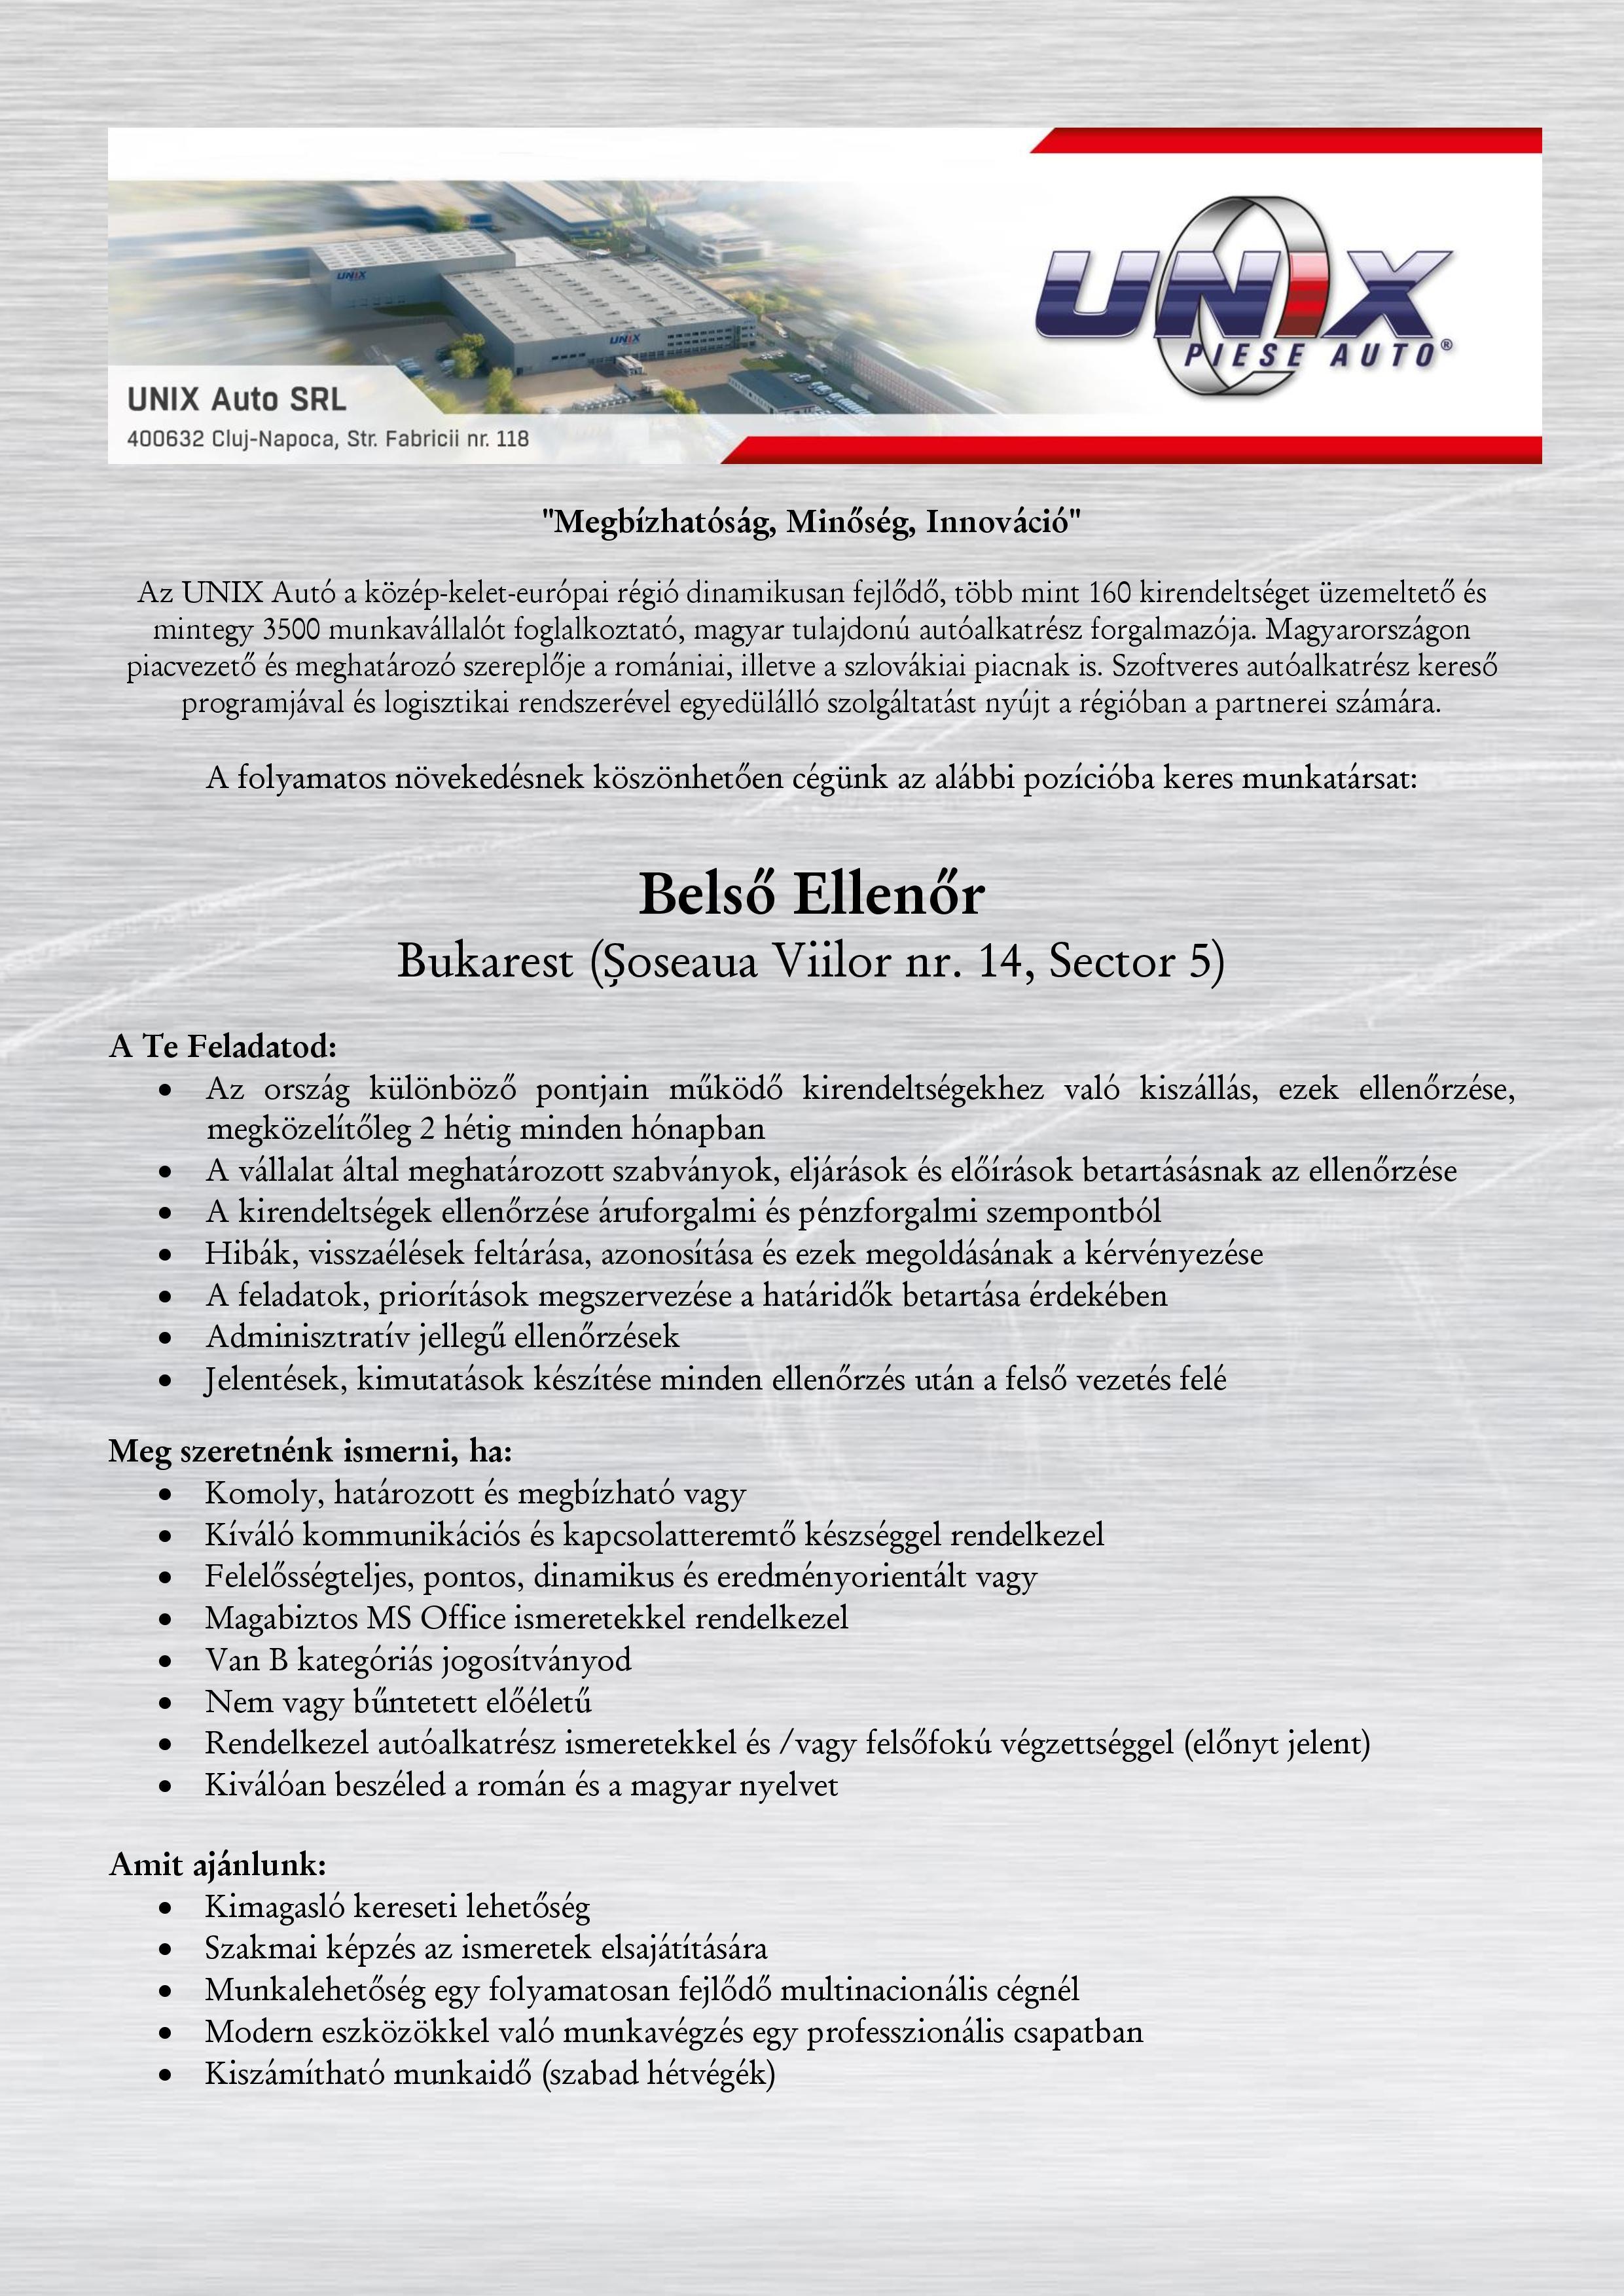 Belso Ellenor - BestJobs-page-001